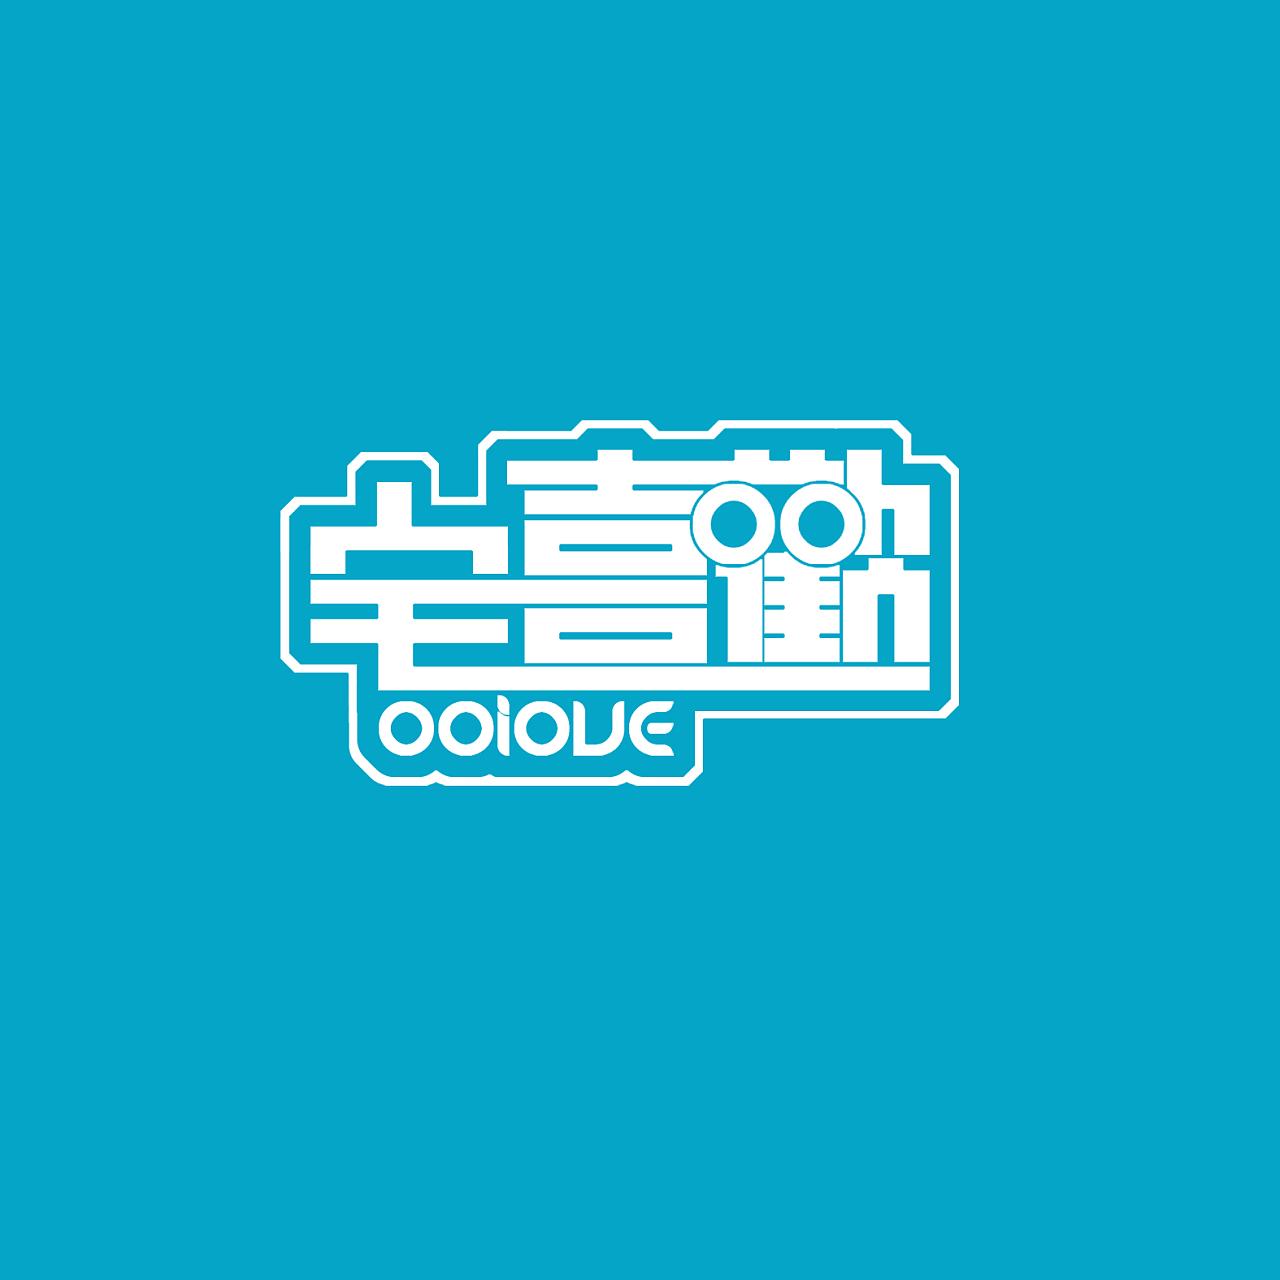 365selang_家居品牌logo 及 网站 修正版 平面 标志 selangtao